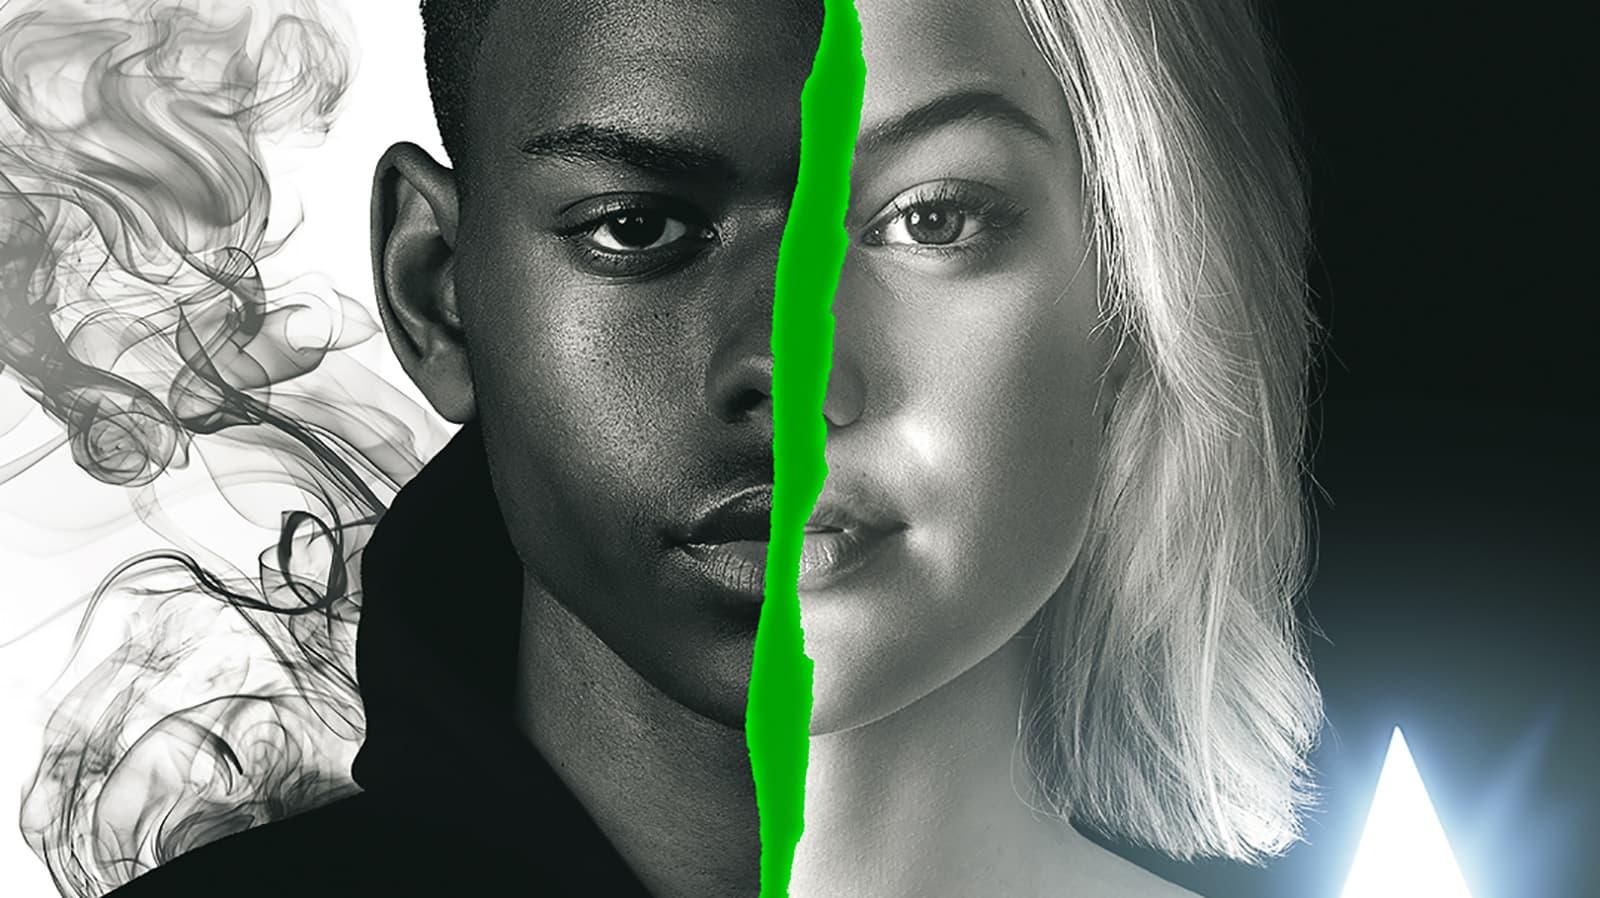 Marvel's Cloak and Dagger Season 2 Poster